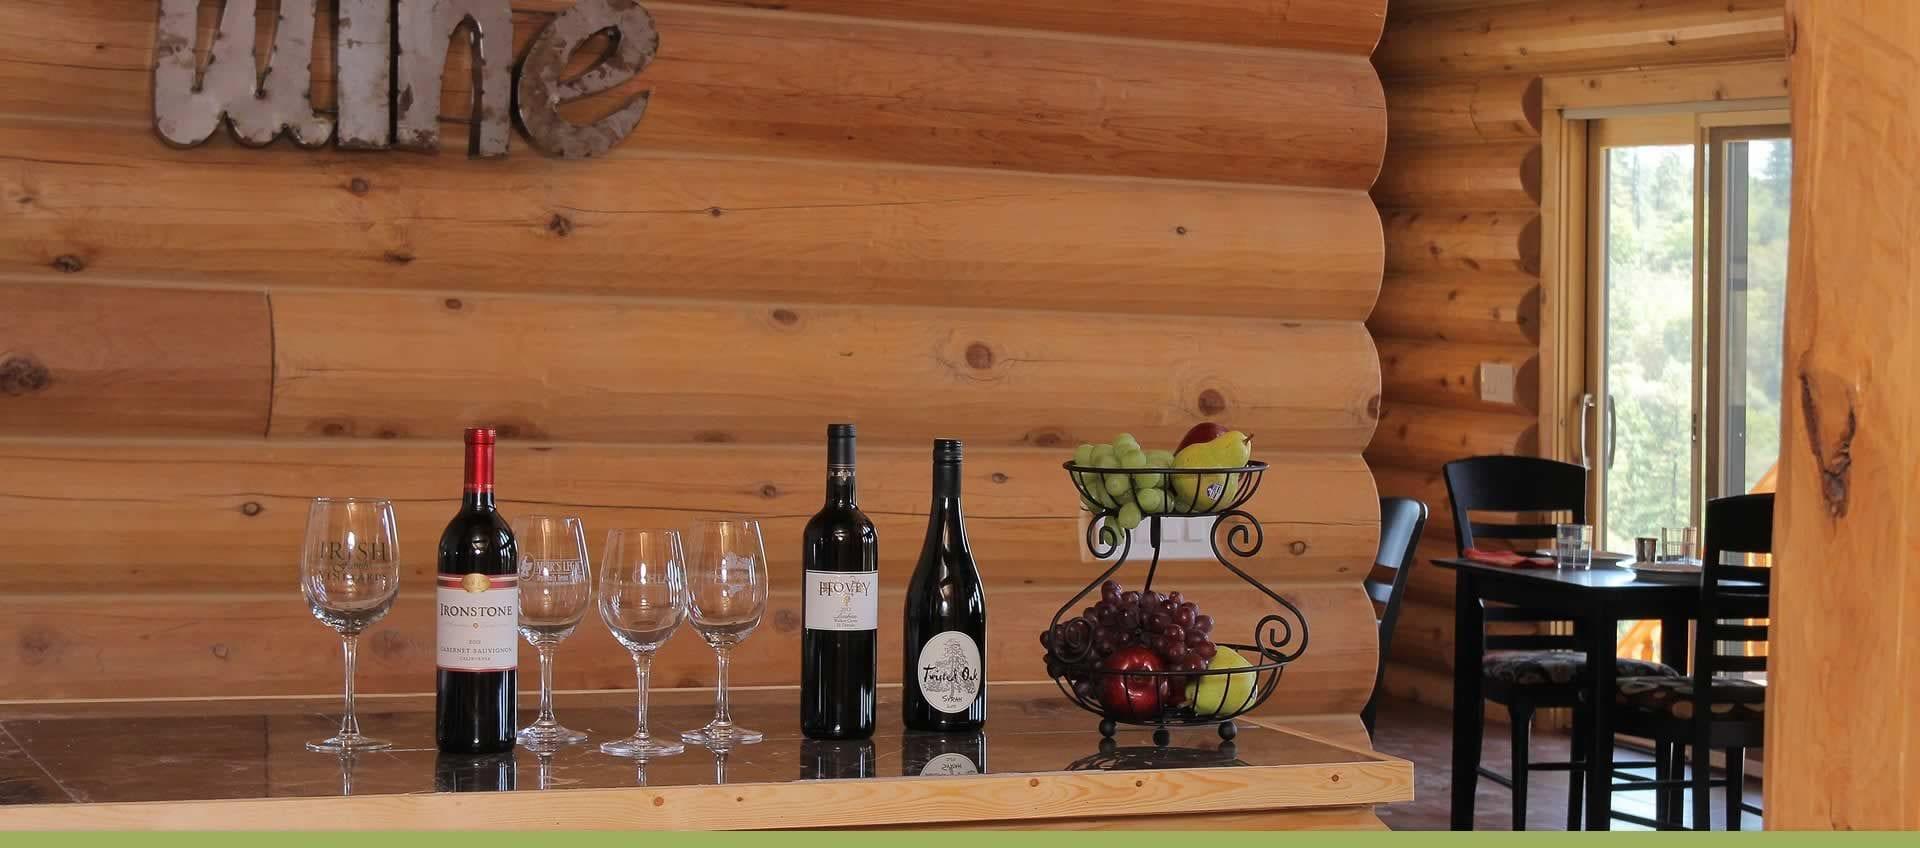 courtwood-wine-tasting3